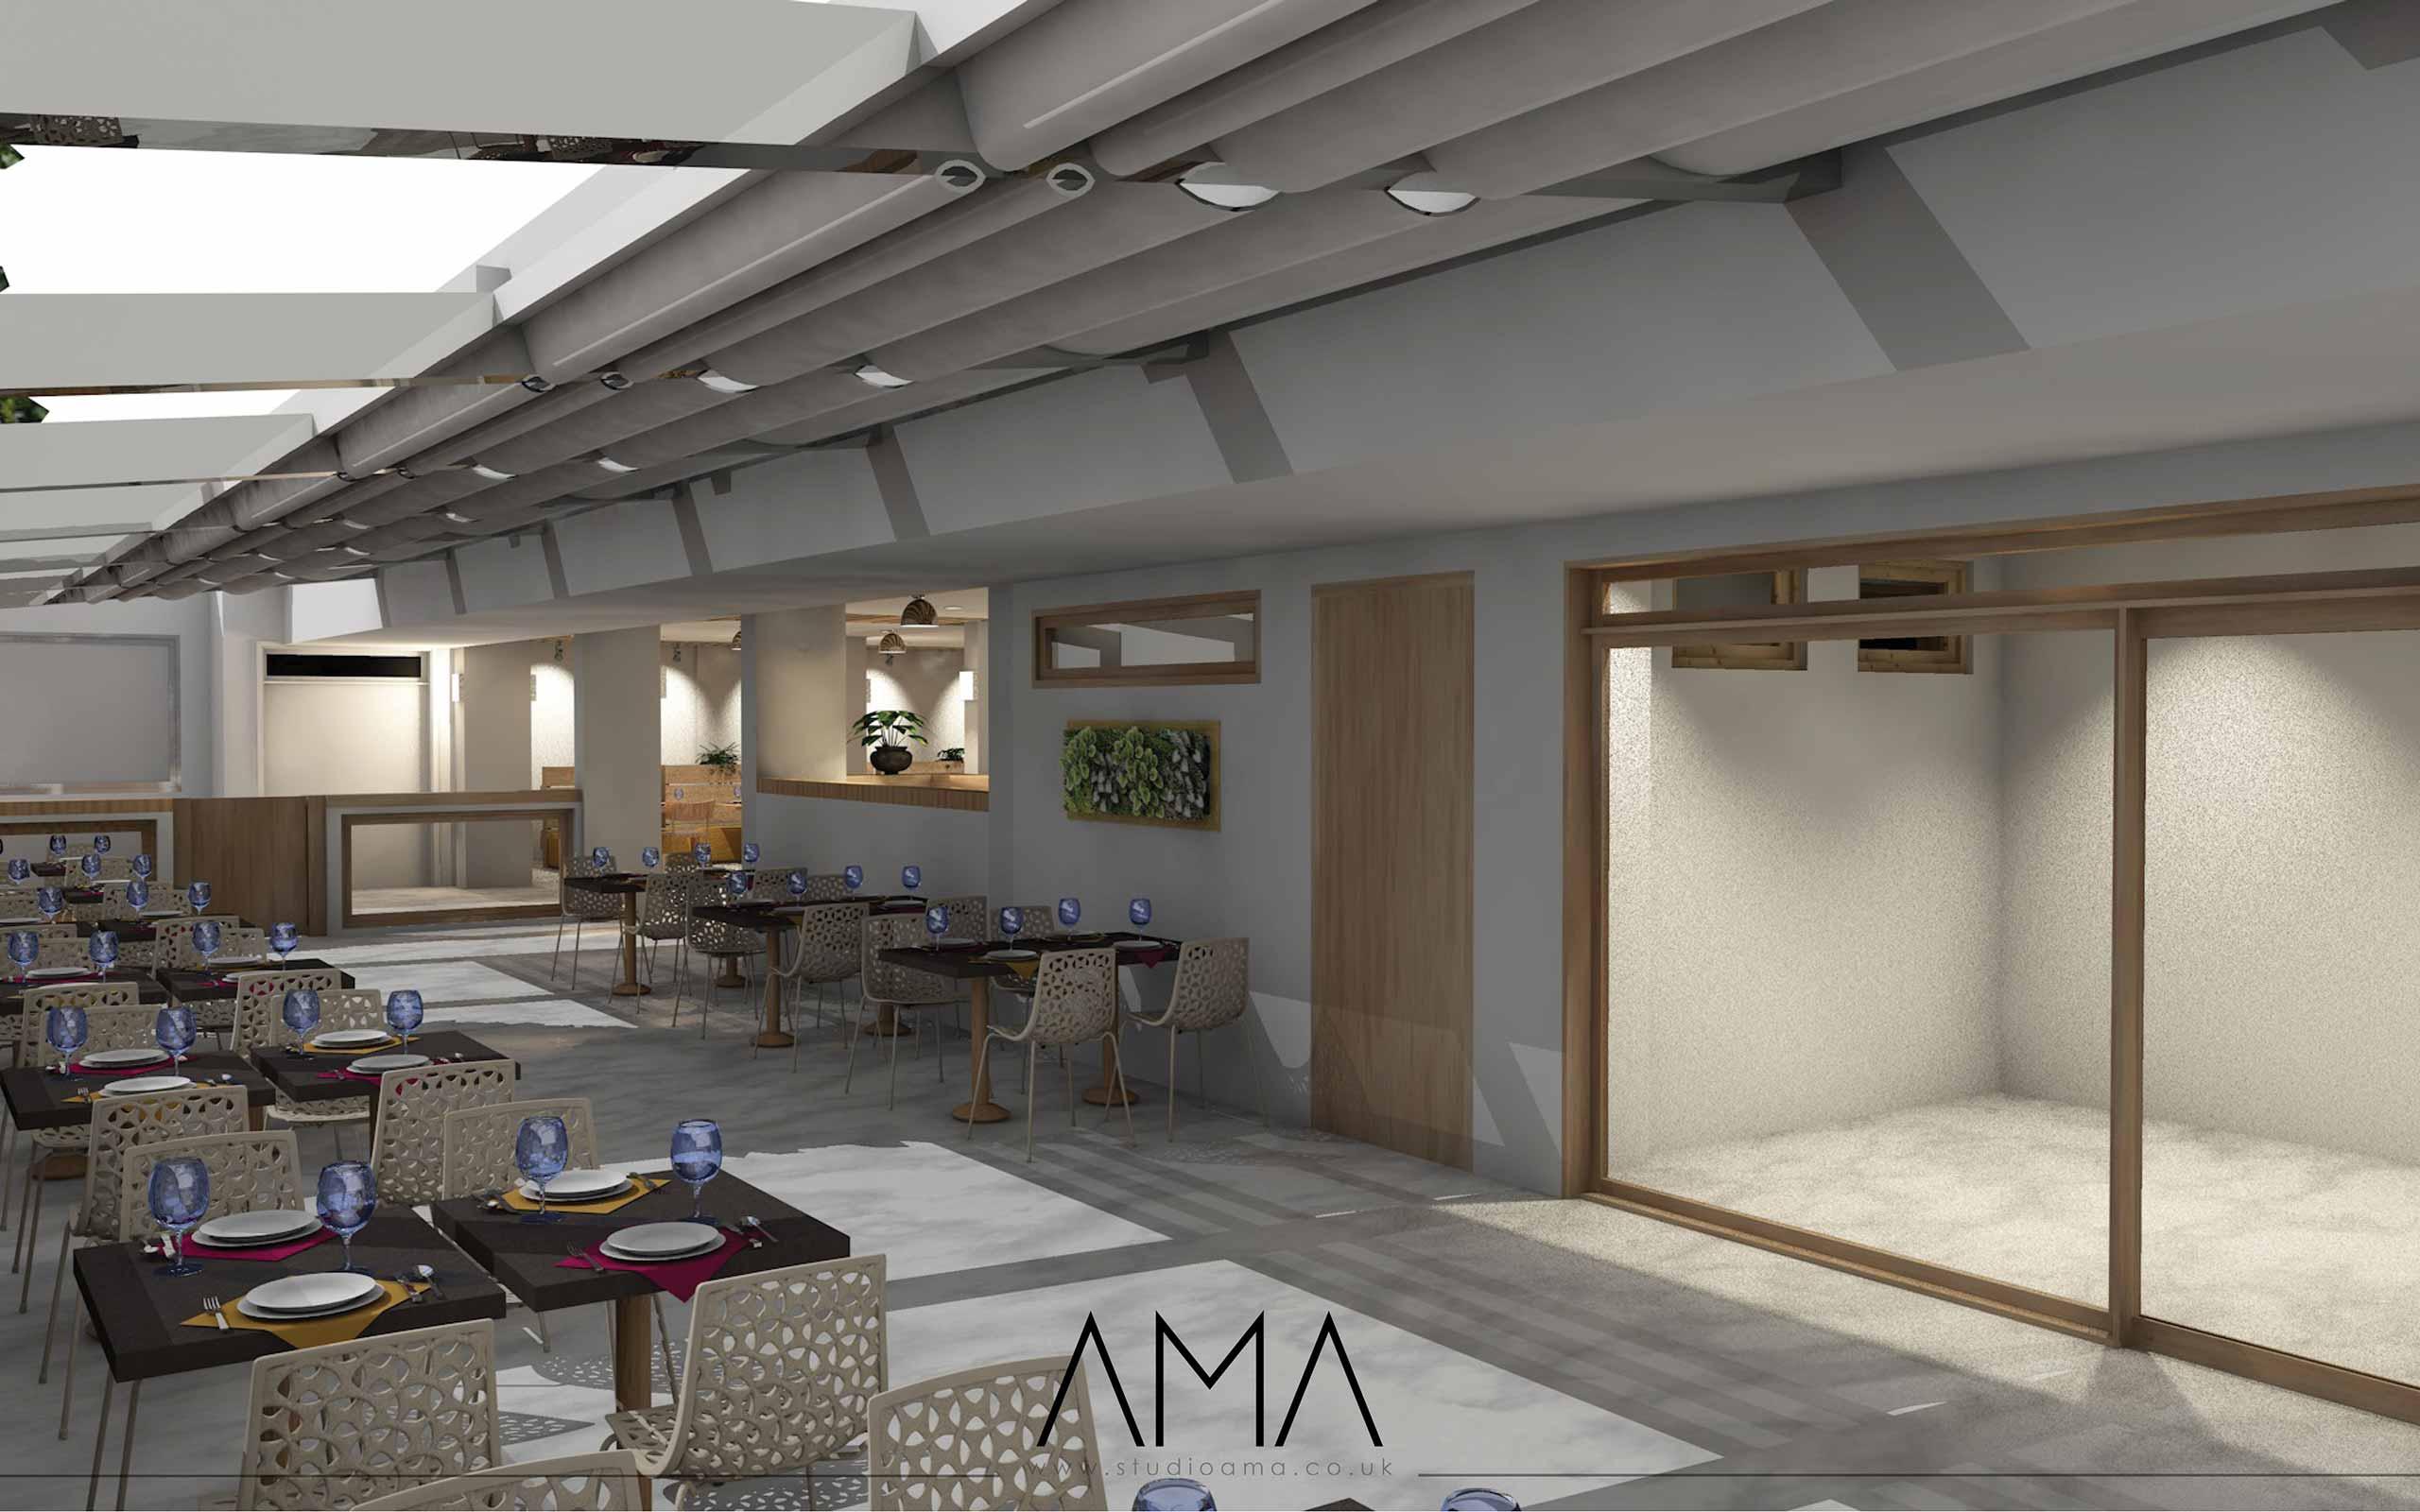 Vegetarian Restaurant Govinda's is Opening Soon in Playa de las Américas